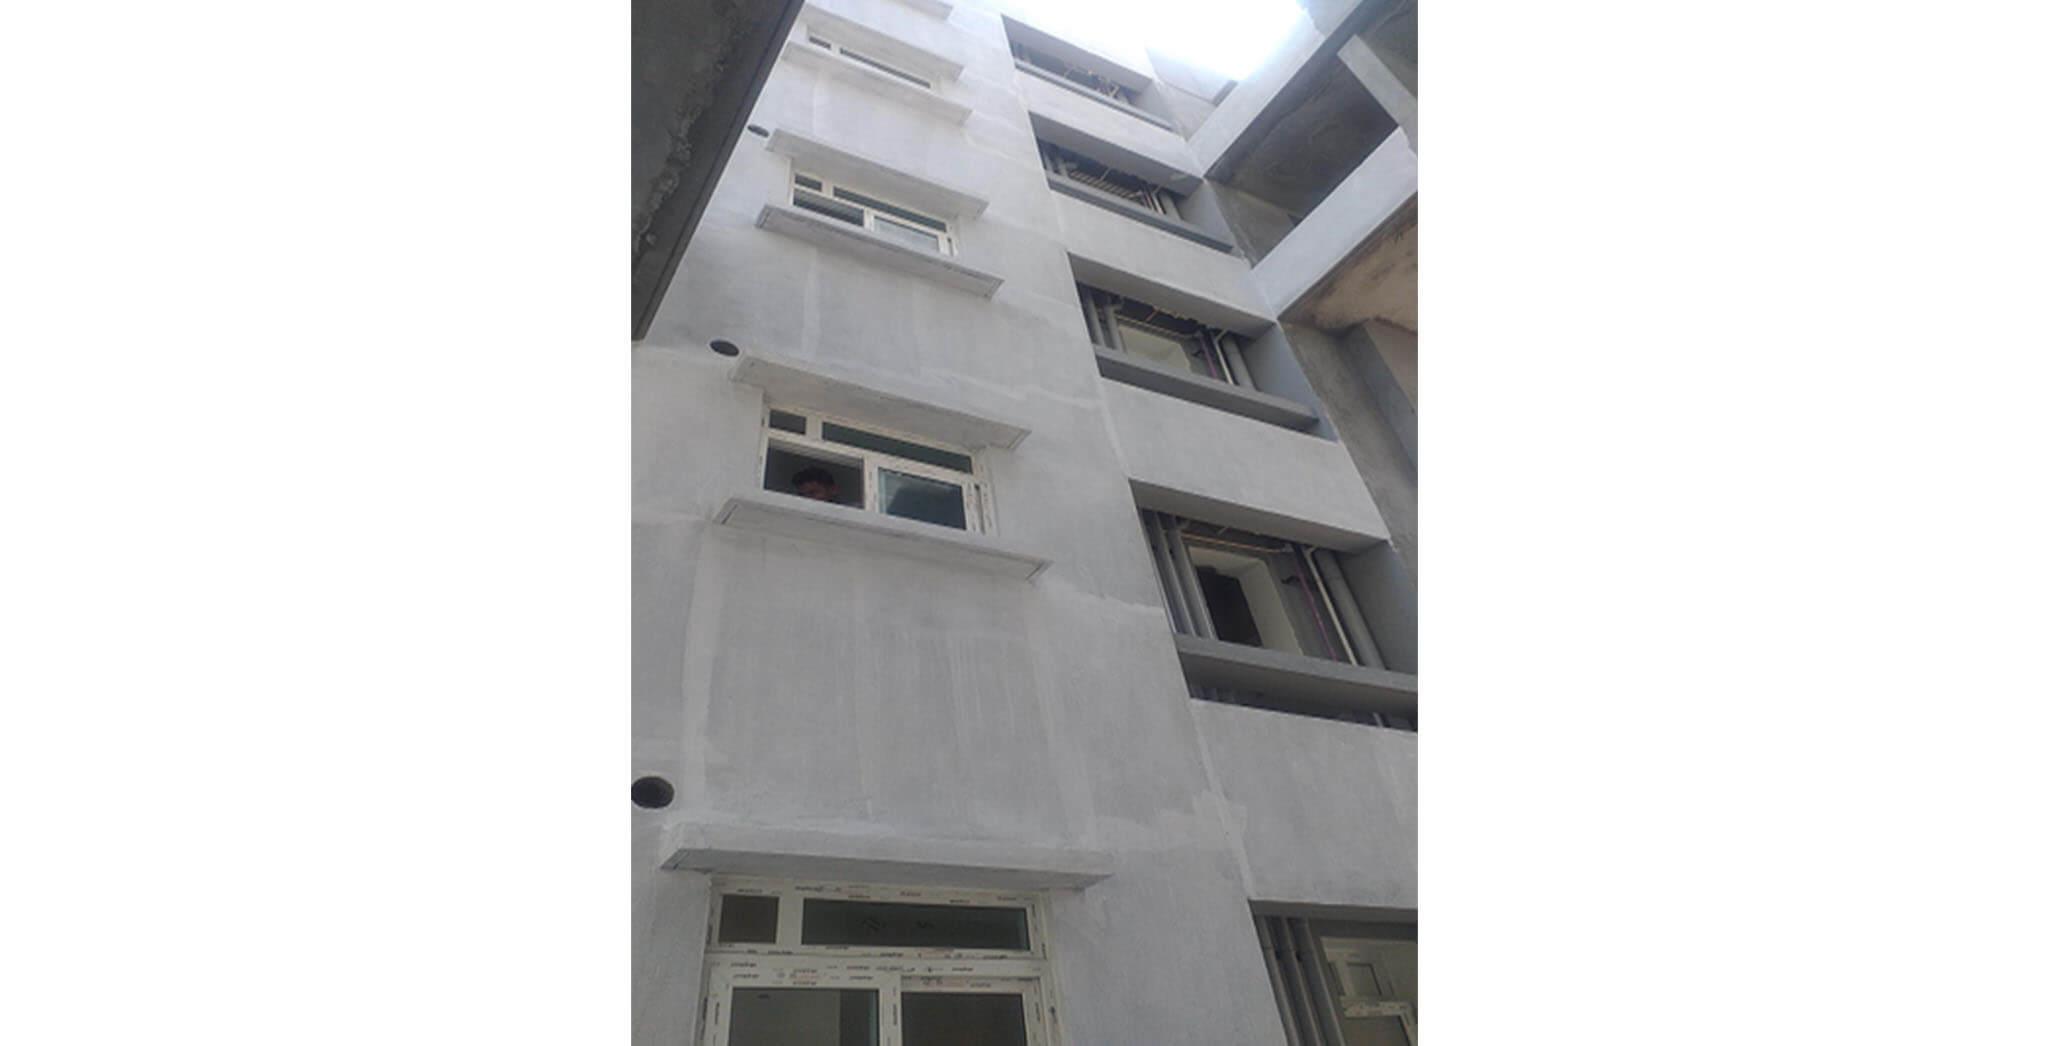 Feb 2021 - Podium side view: K Block—External wall primer work-in-progress